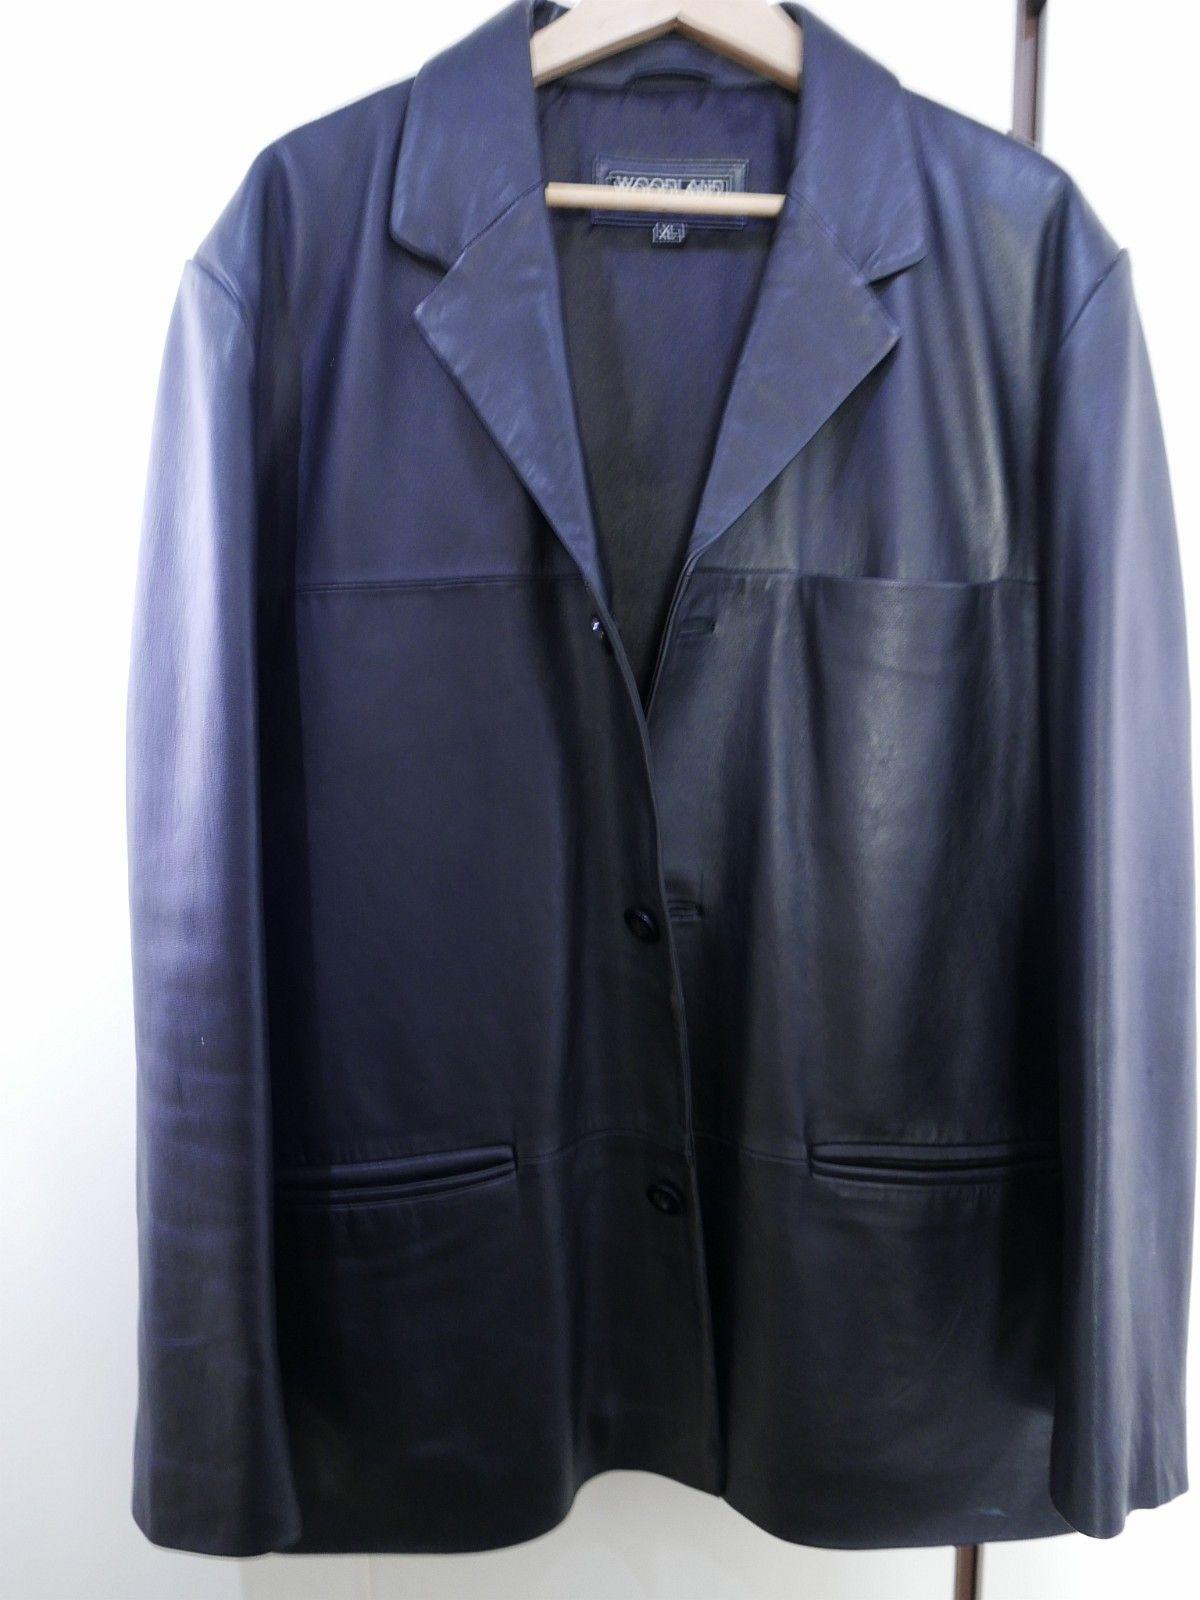 6d274d99 Herre skin jakke st .-XL | FINN.no